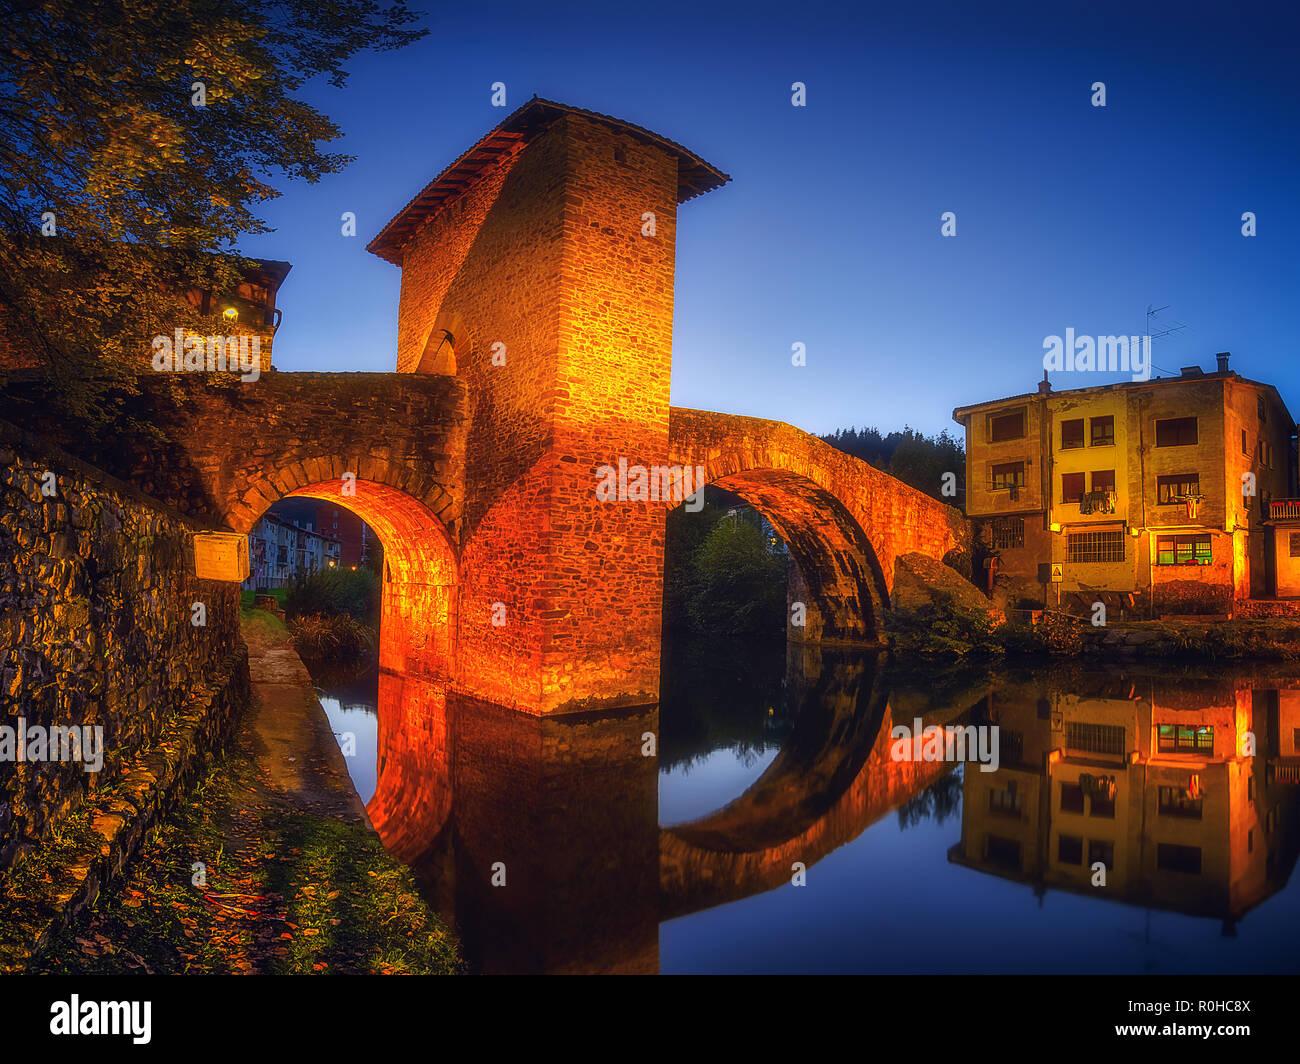 Balmaseda bridge illuminated at night - Stock Image